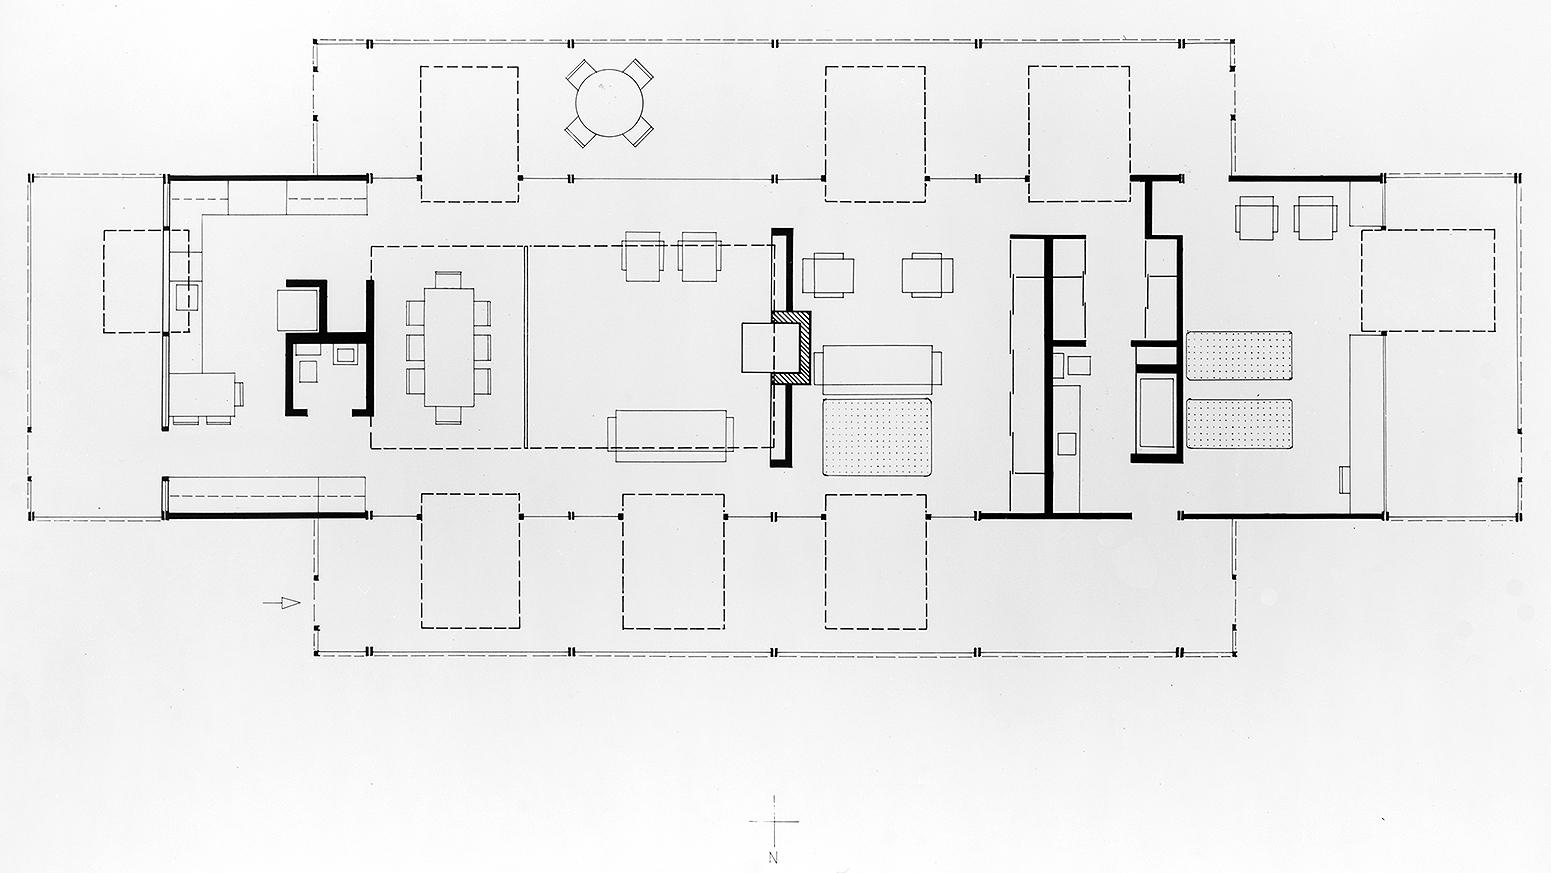 Davidson Residence, Bradenton, Florida. Floor Plan.